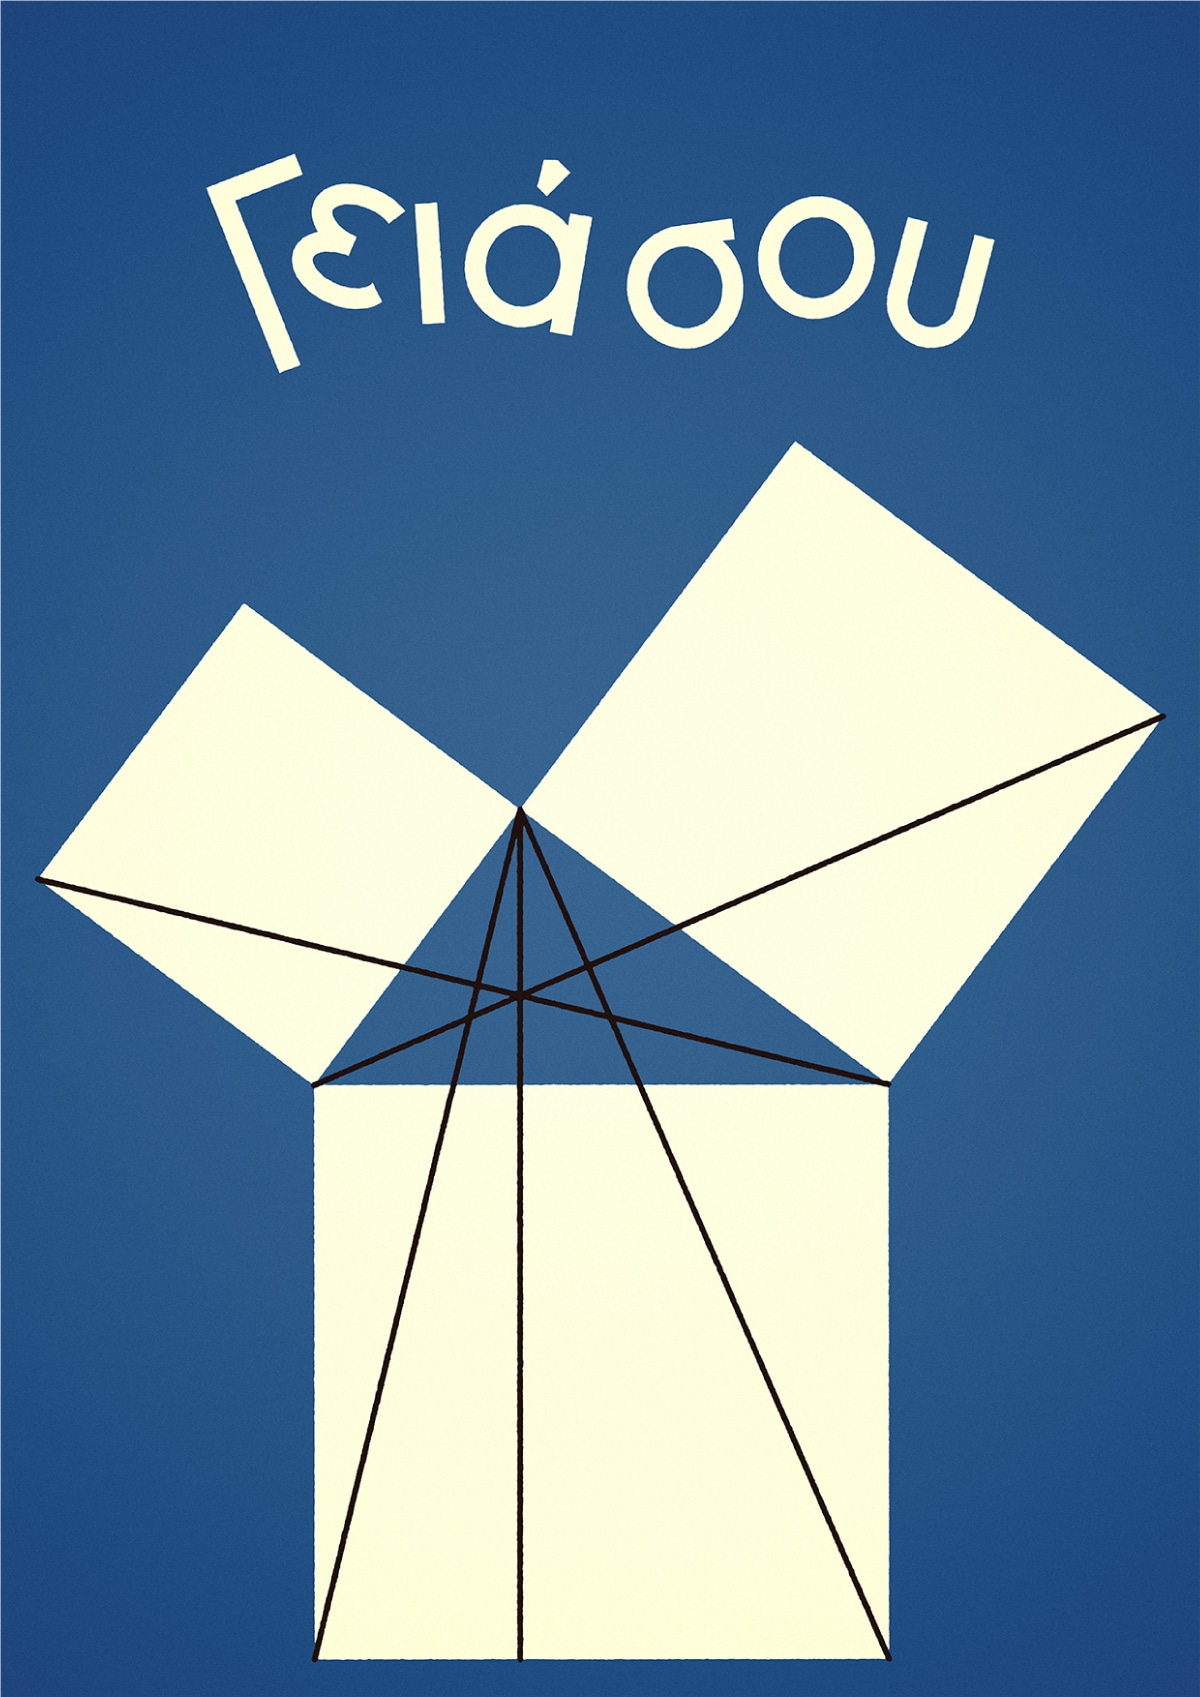 Poster Illustrating European Union Countries